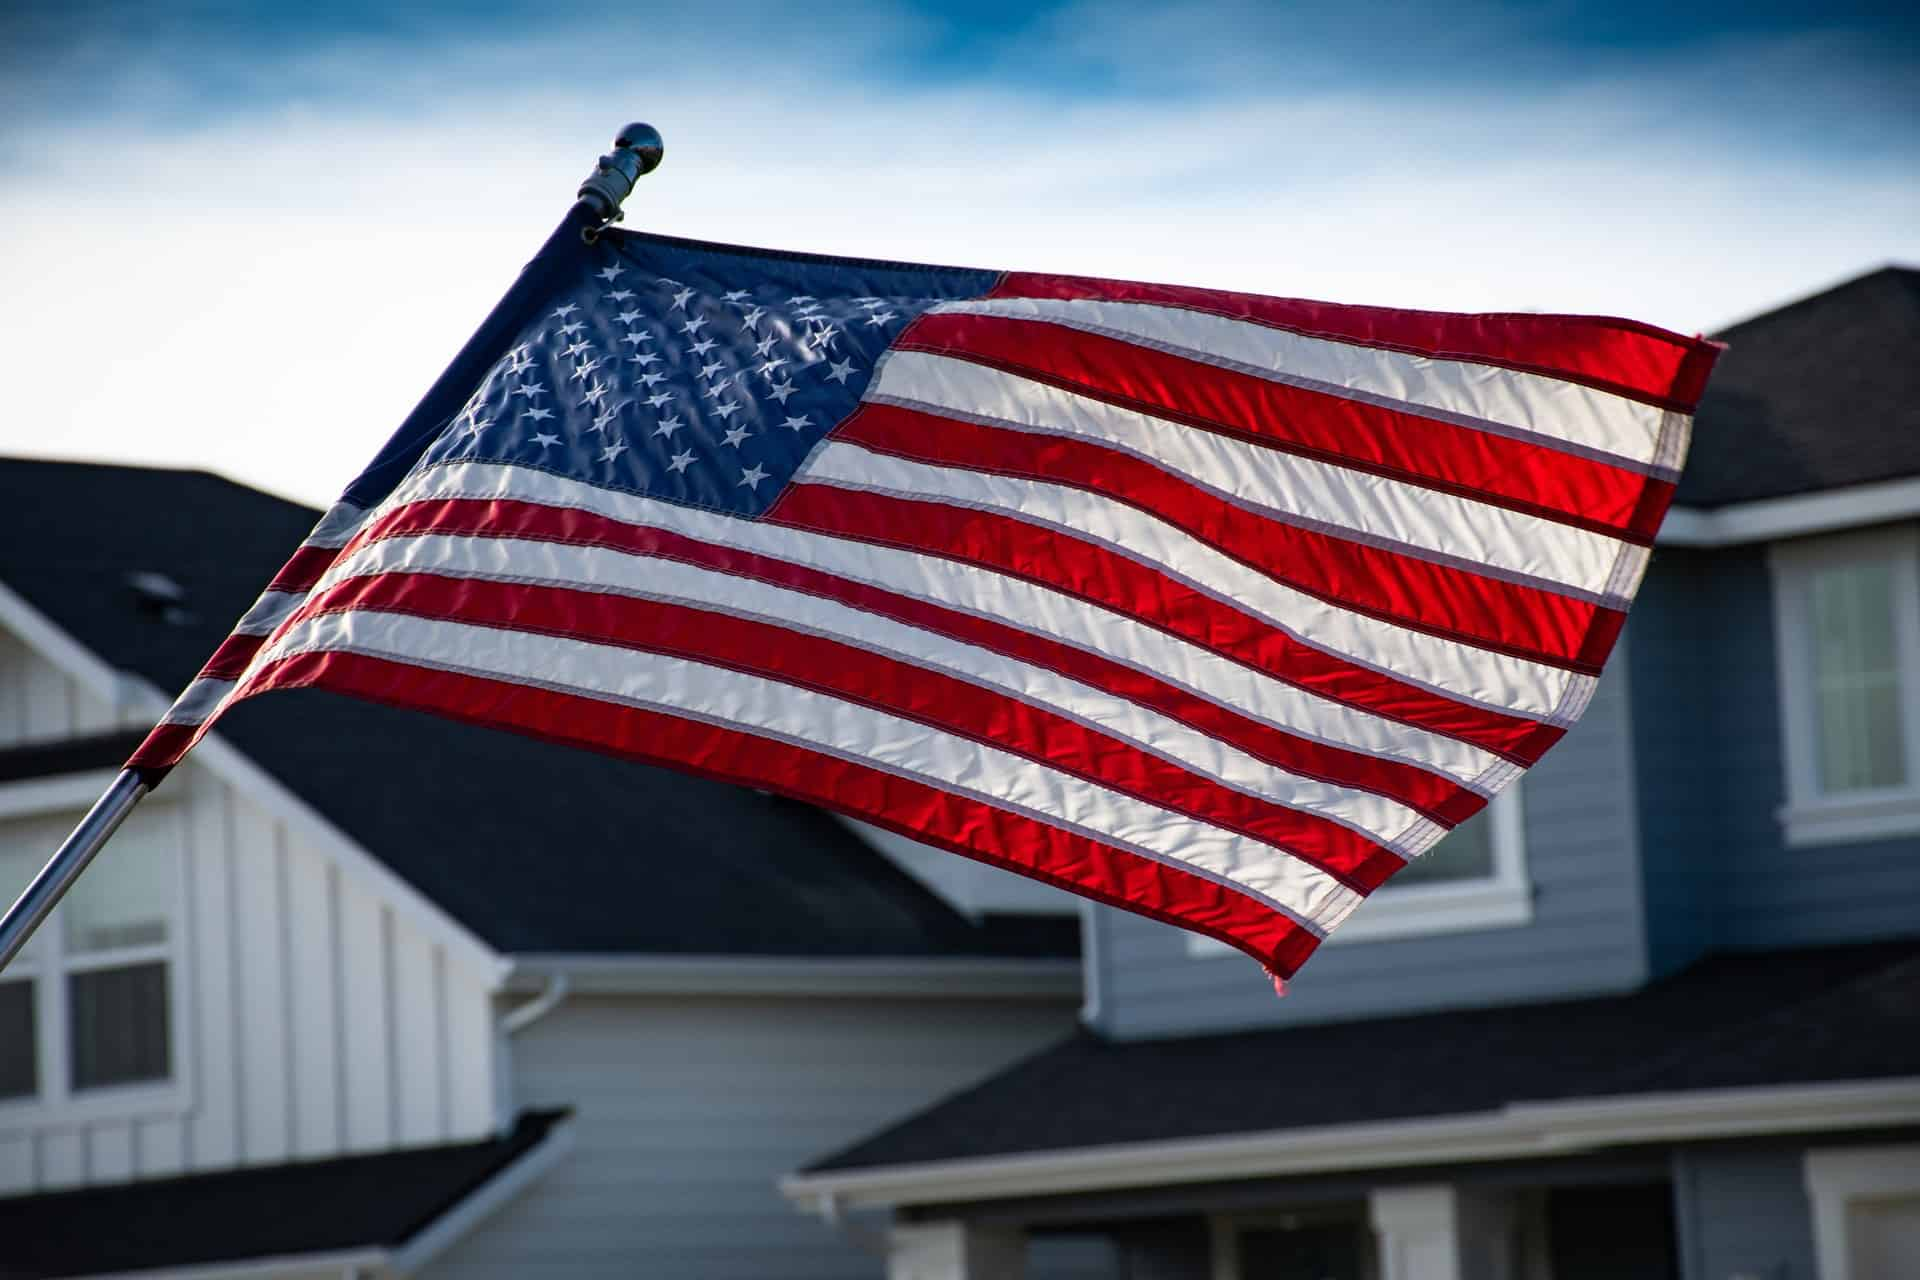 How To Keep Flag From Wrapping Around Pole #flag #backyarddesign #exteriordesign #outdoordecor #backyardDecor #backyard